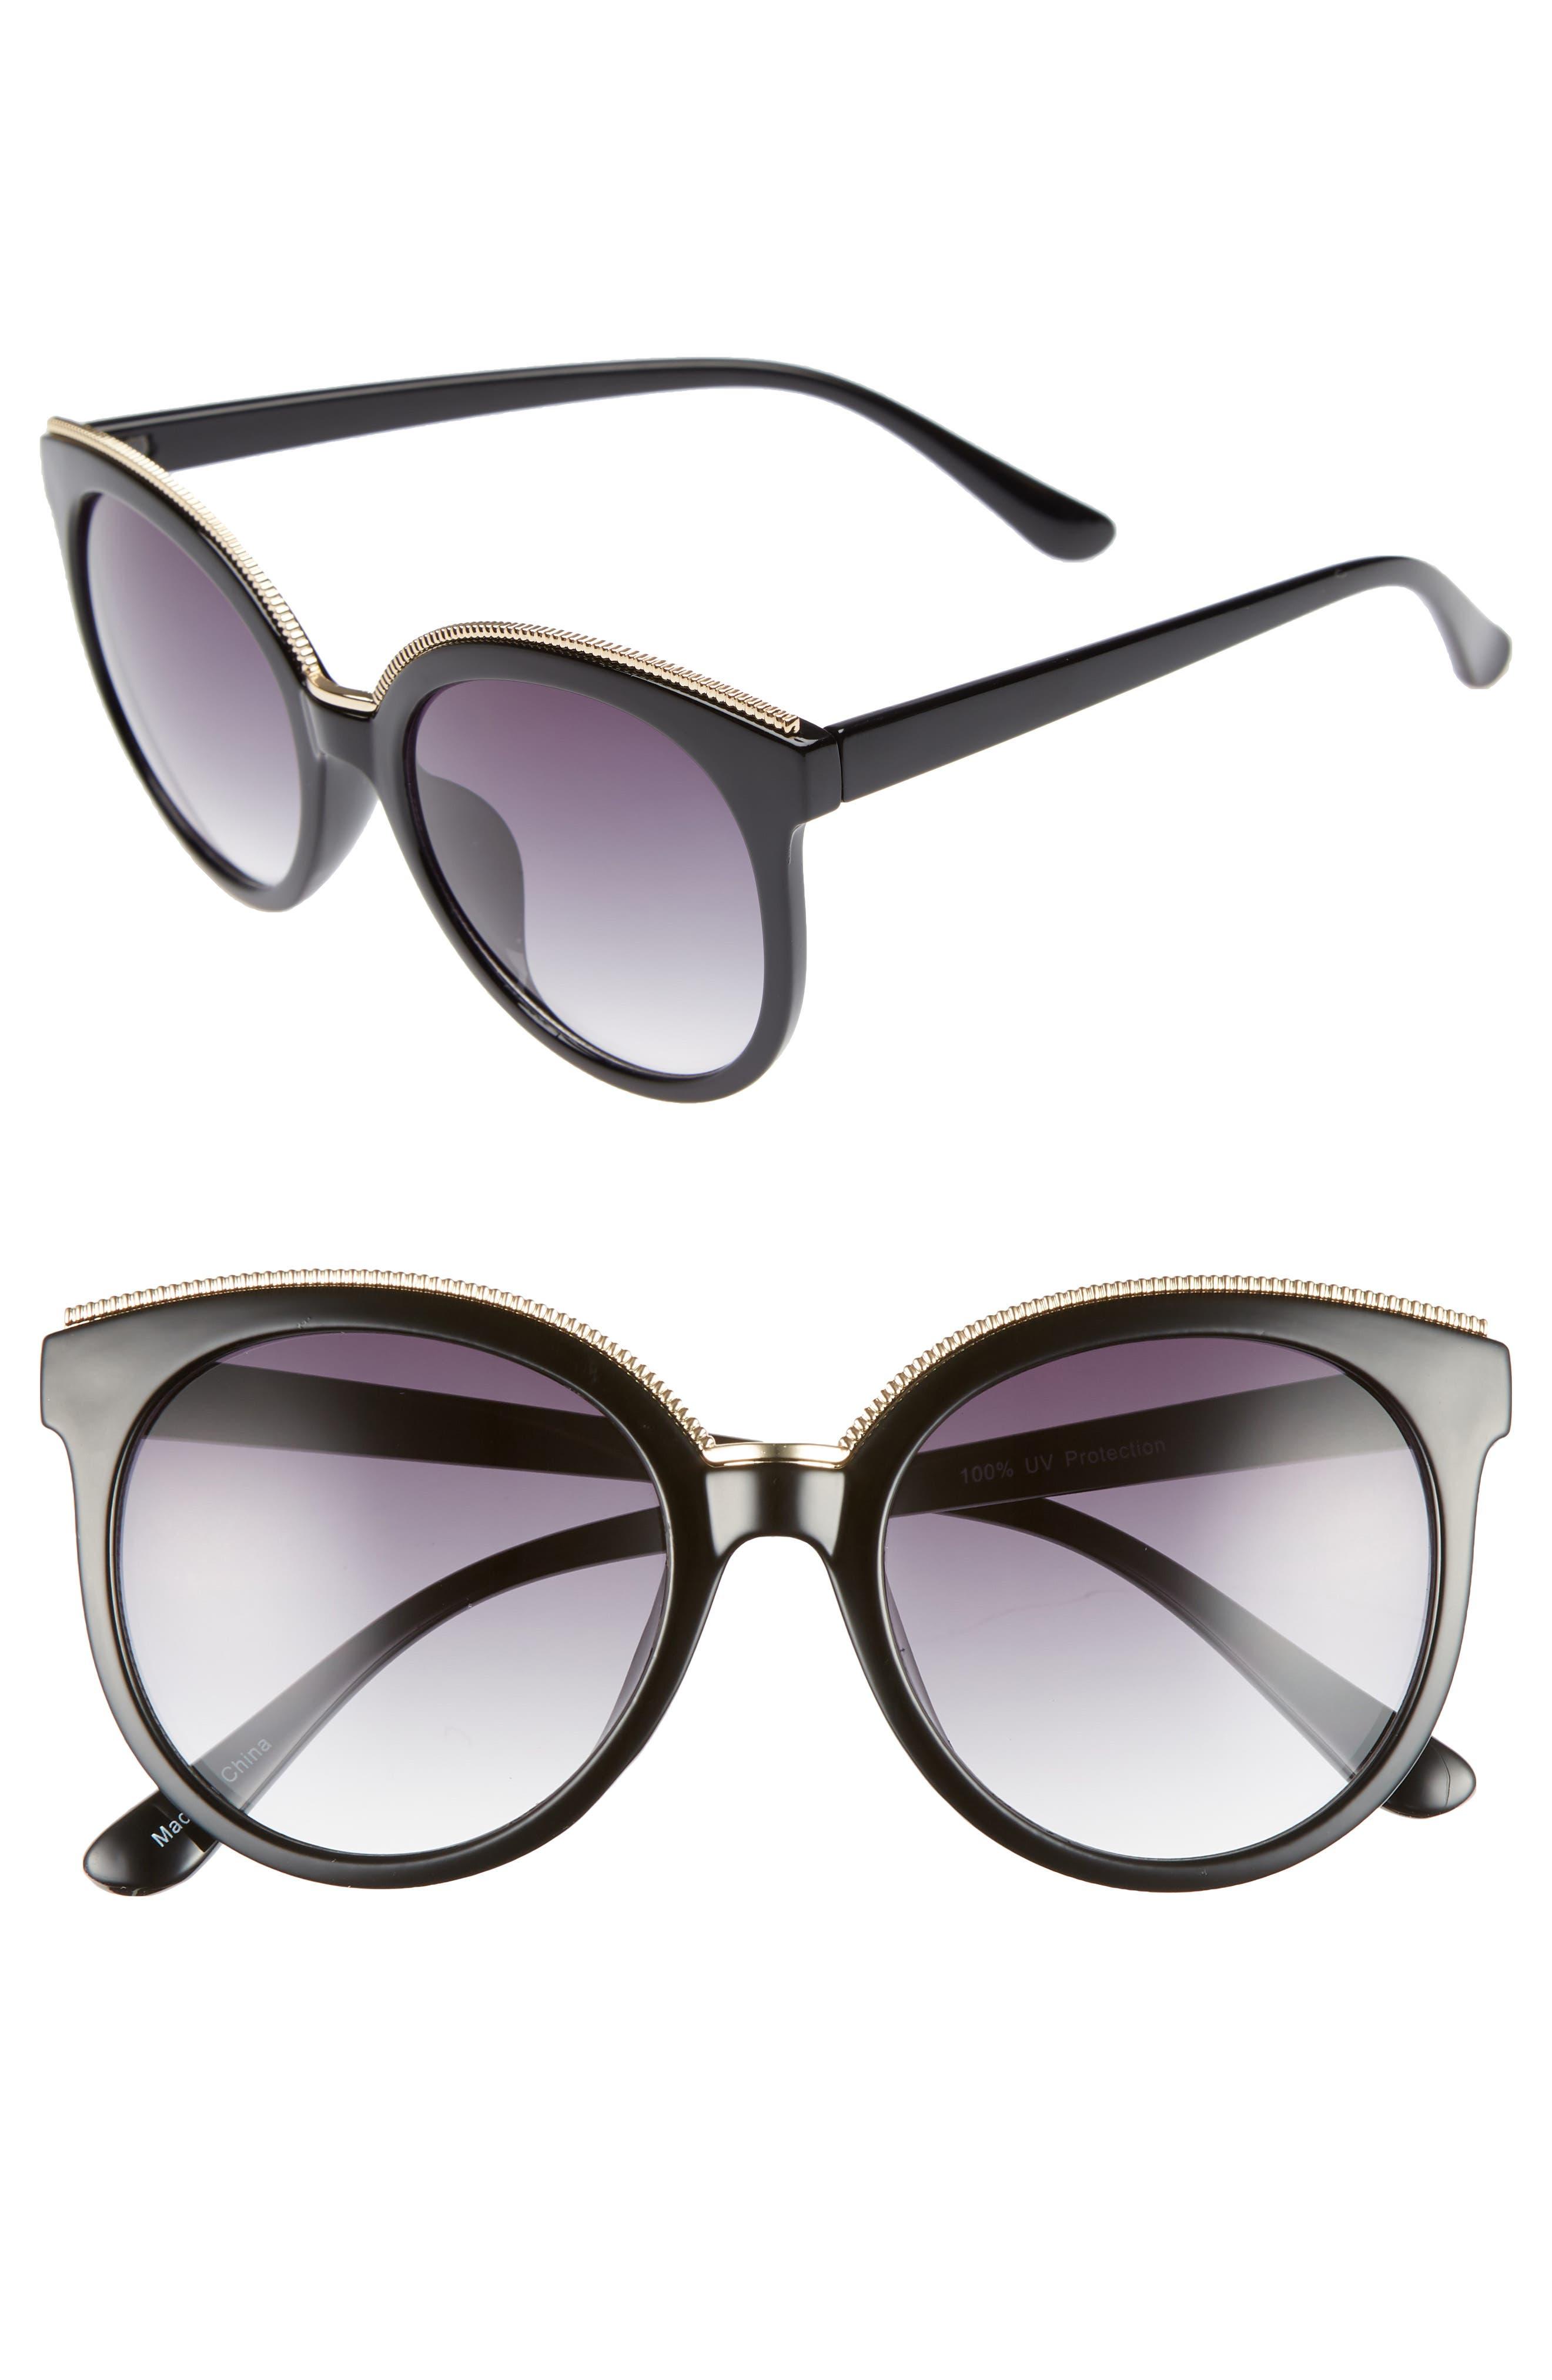 56mm Metal Trim Round Sunglasses,                             Main thumbnail 1, color,                             Black/ Gold